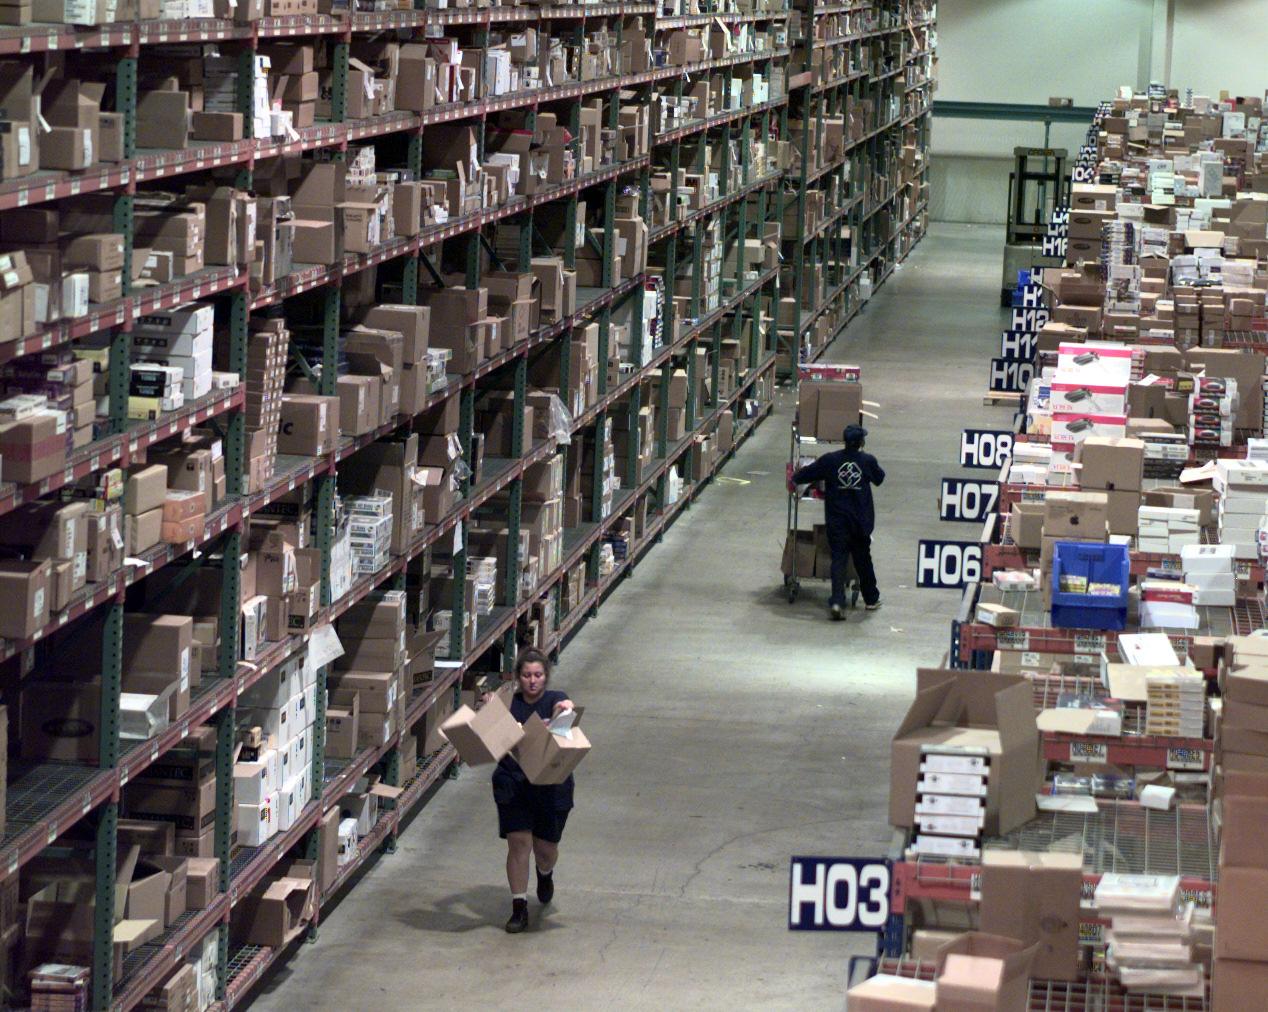 FI.Ingram.shelves.D.072298.KRH––Warehouse workers pick up orders for games, software, hard drives an